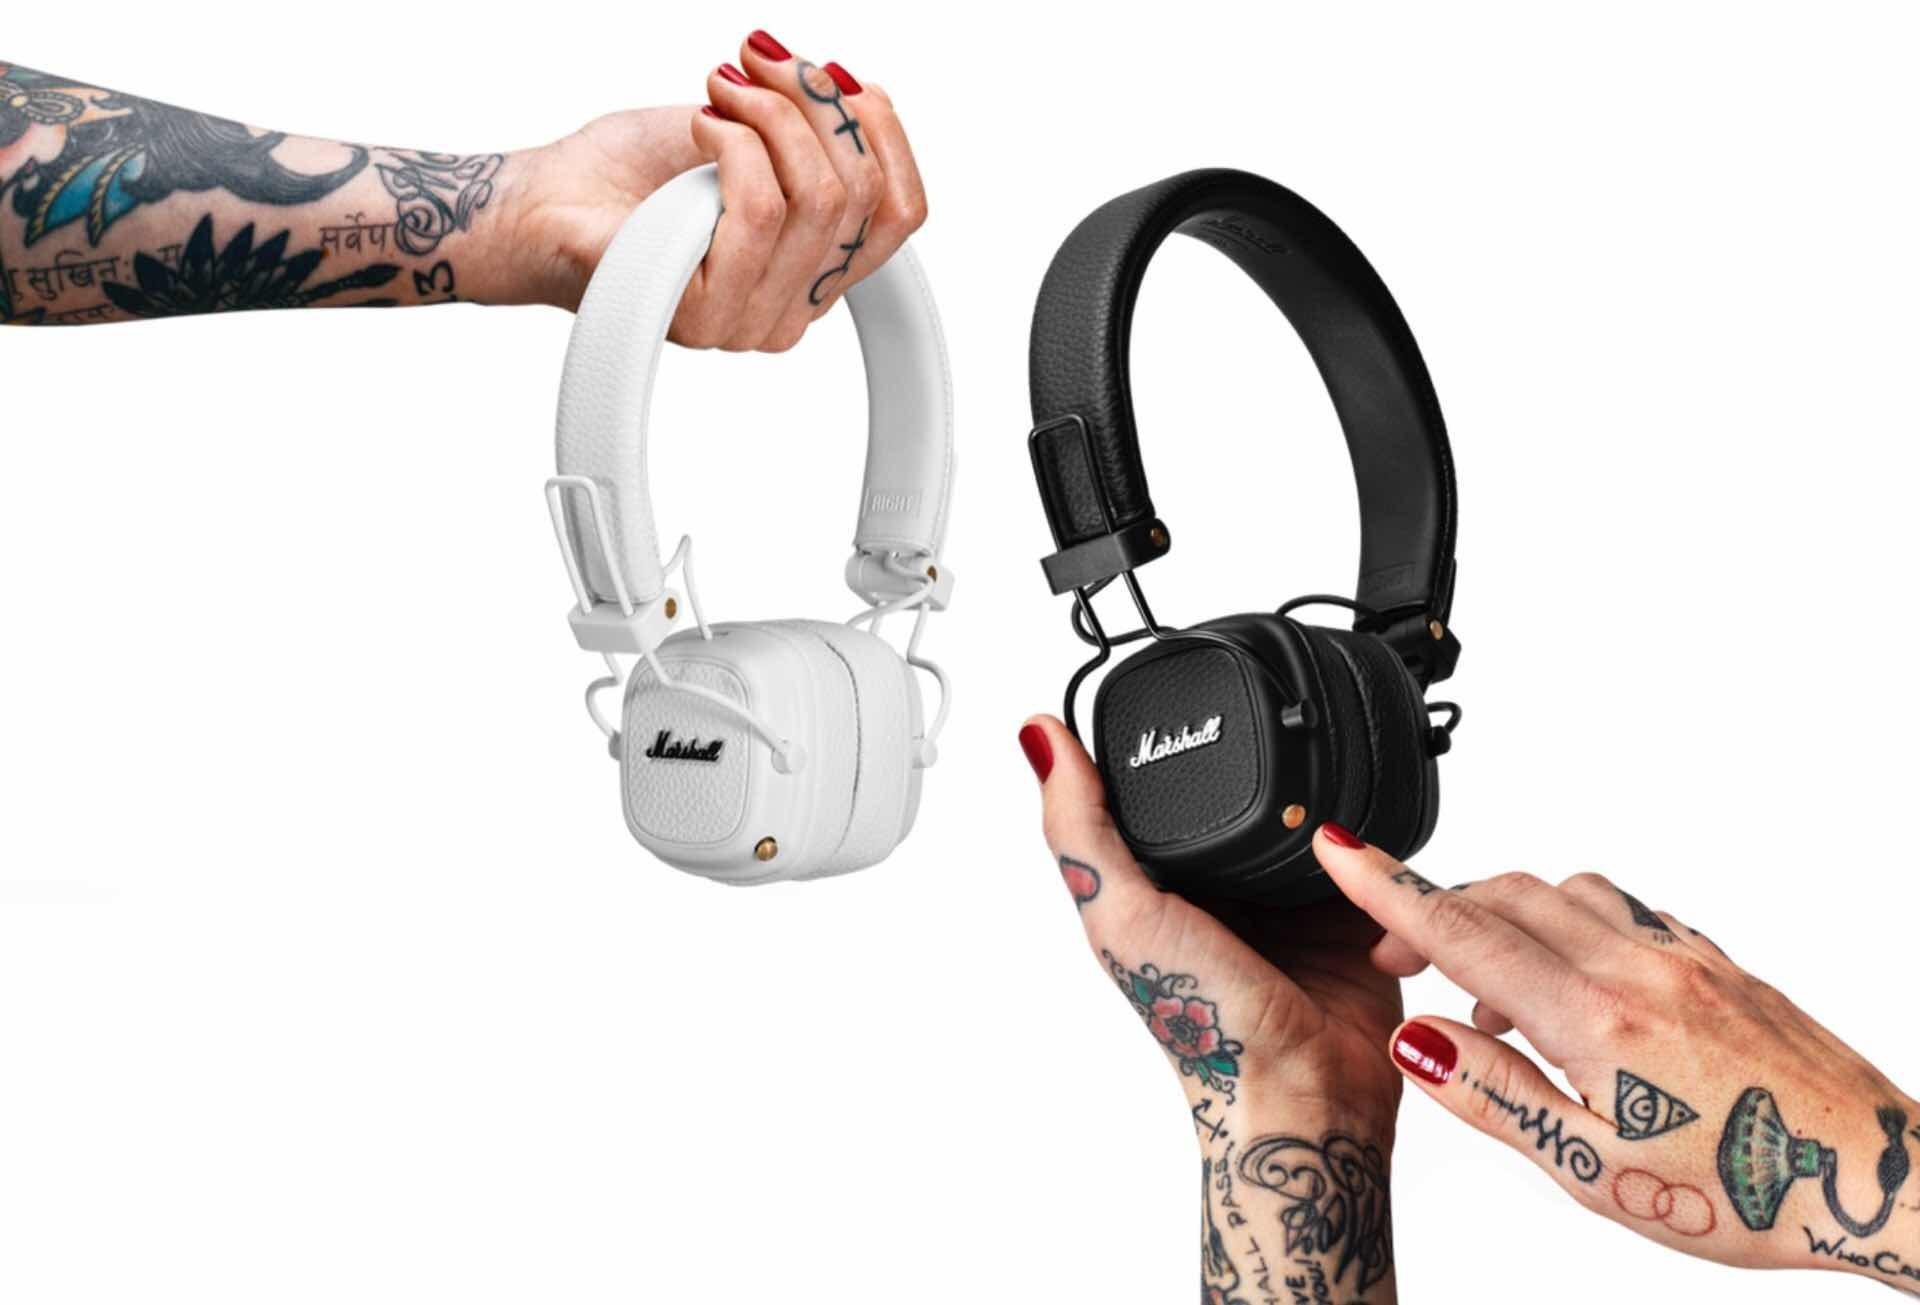 marshall-major-iii-wireless-on-ear-headphones-3